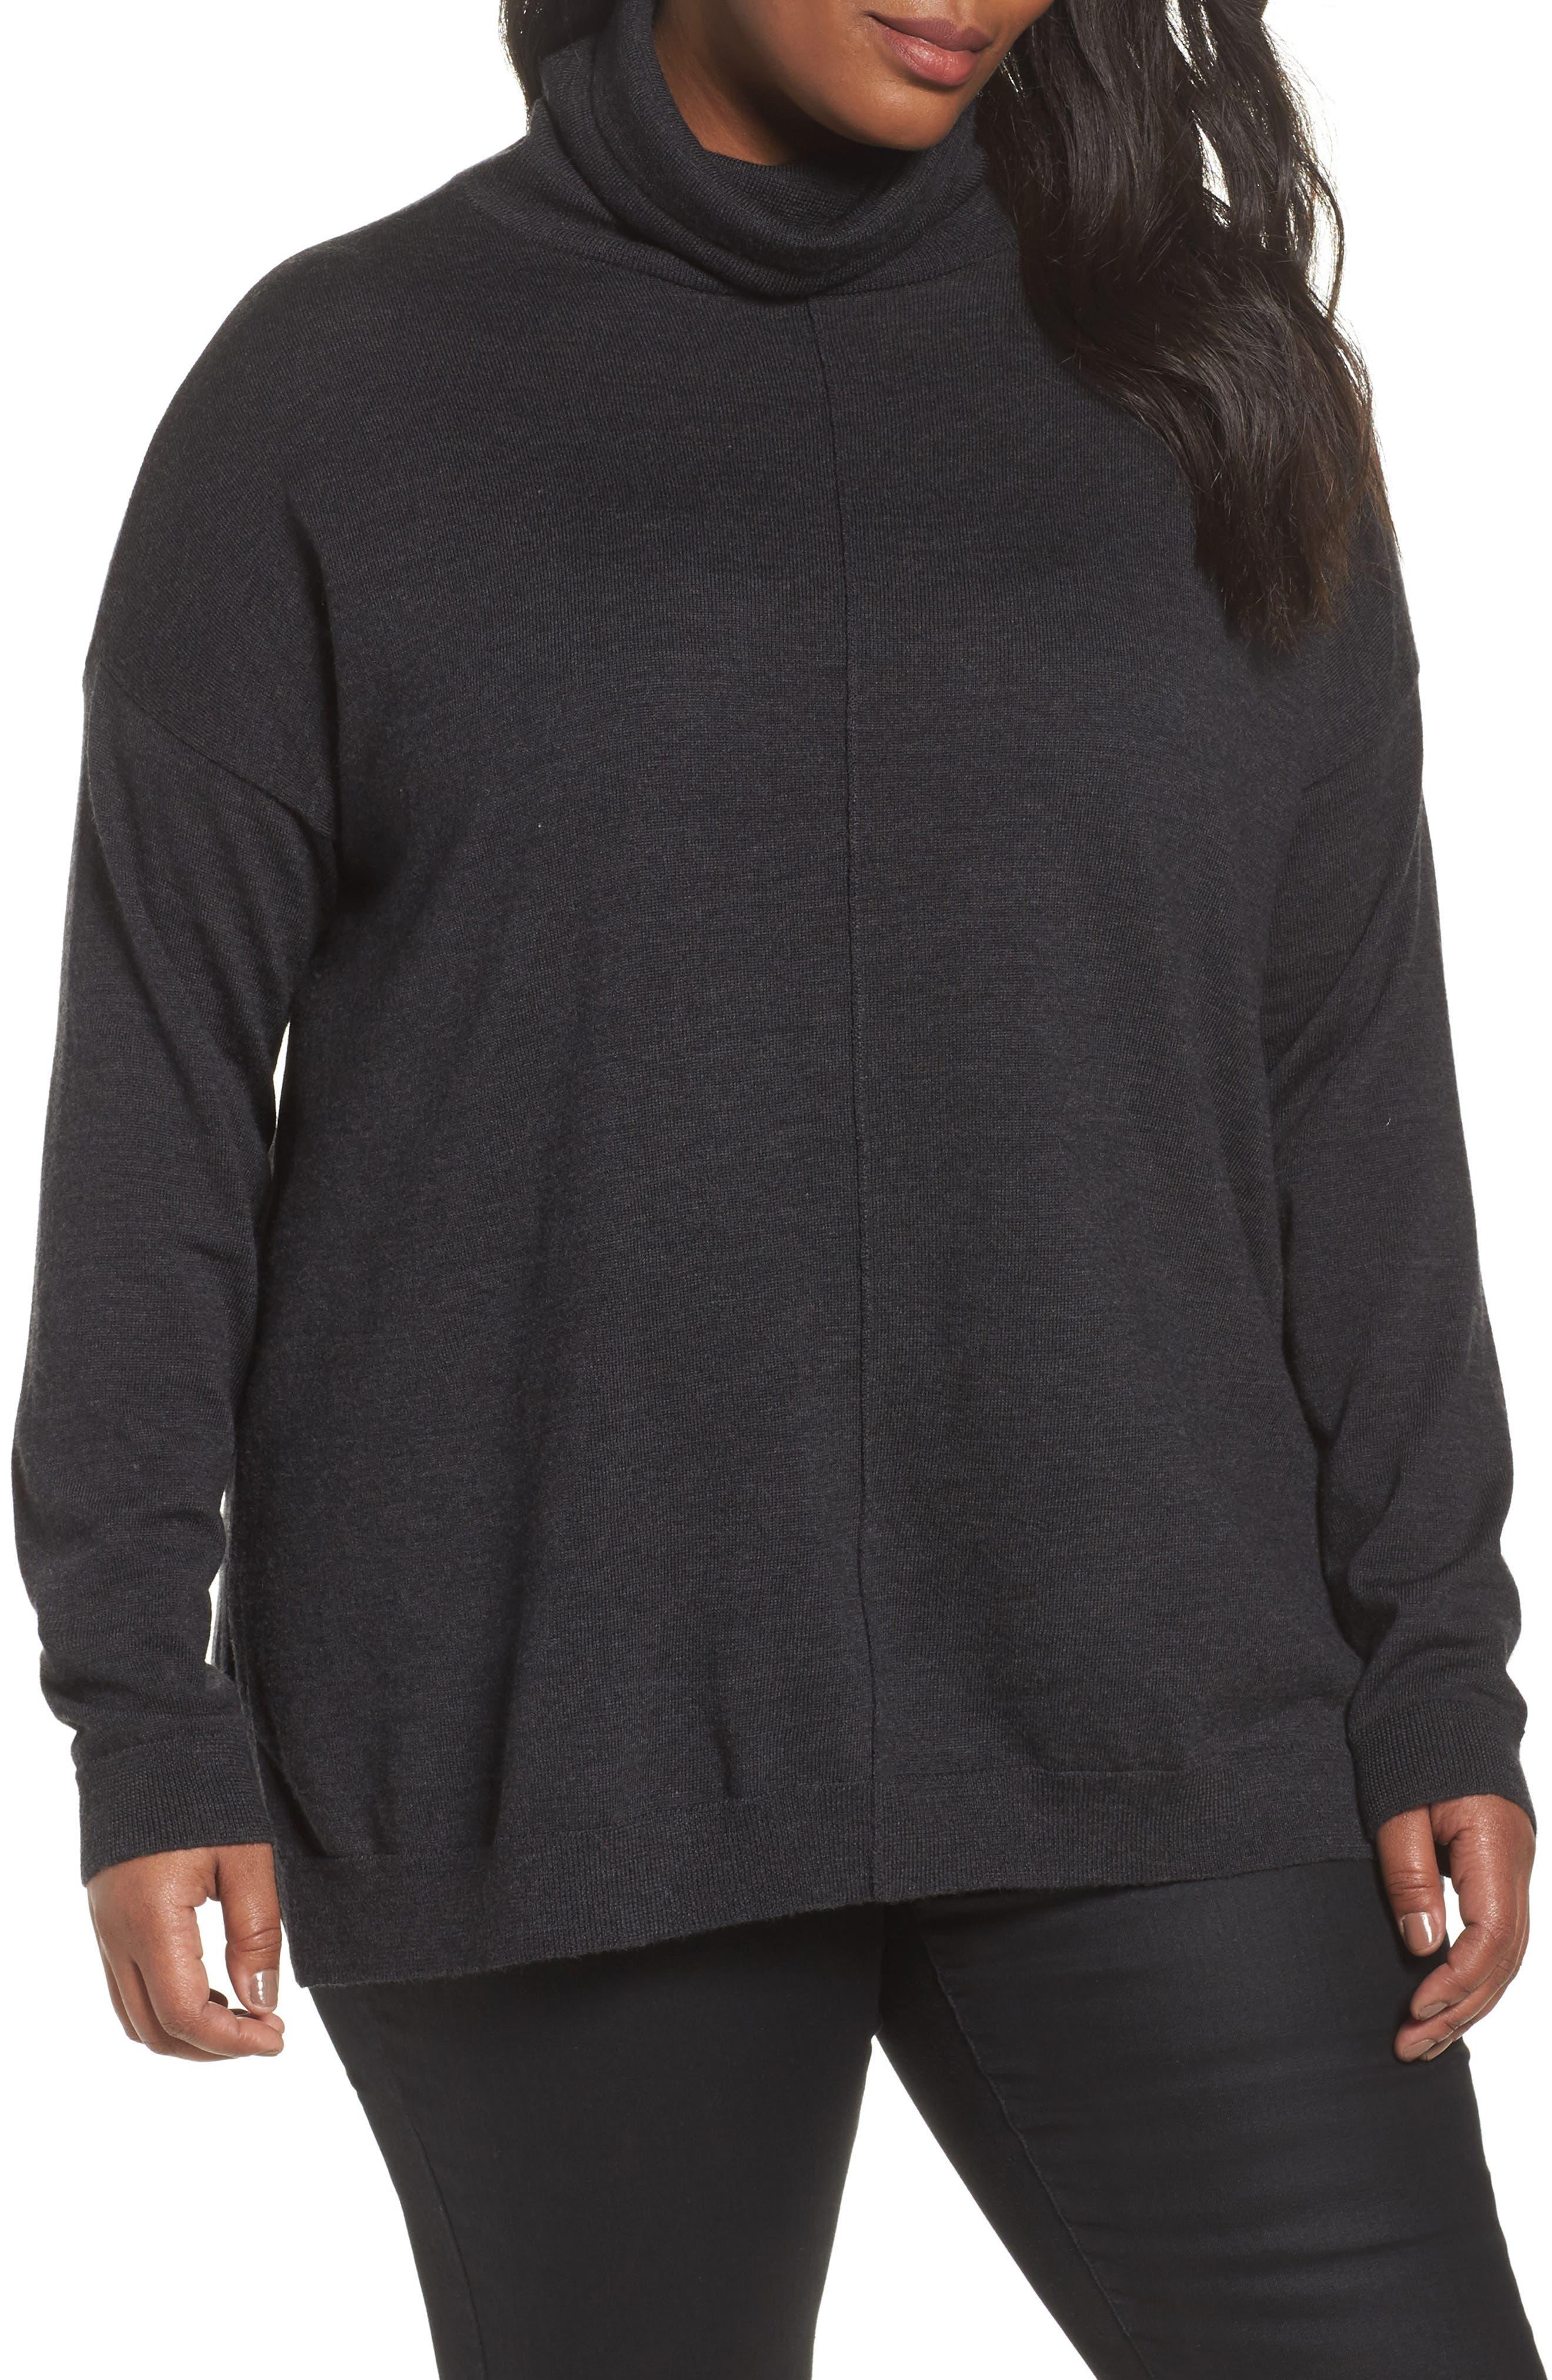 Merino Wool Turtleneck Sweater,                         Main,                         color, 021